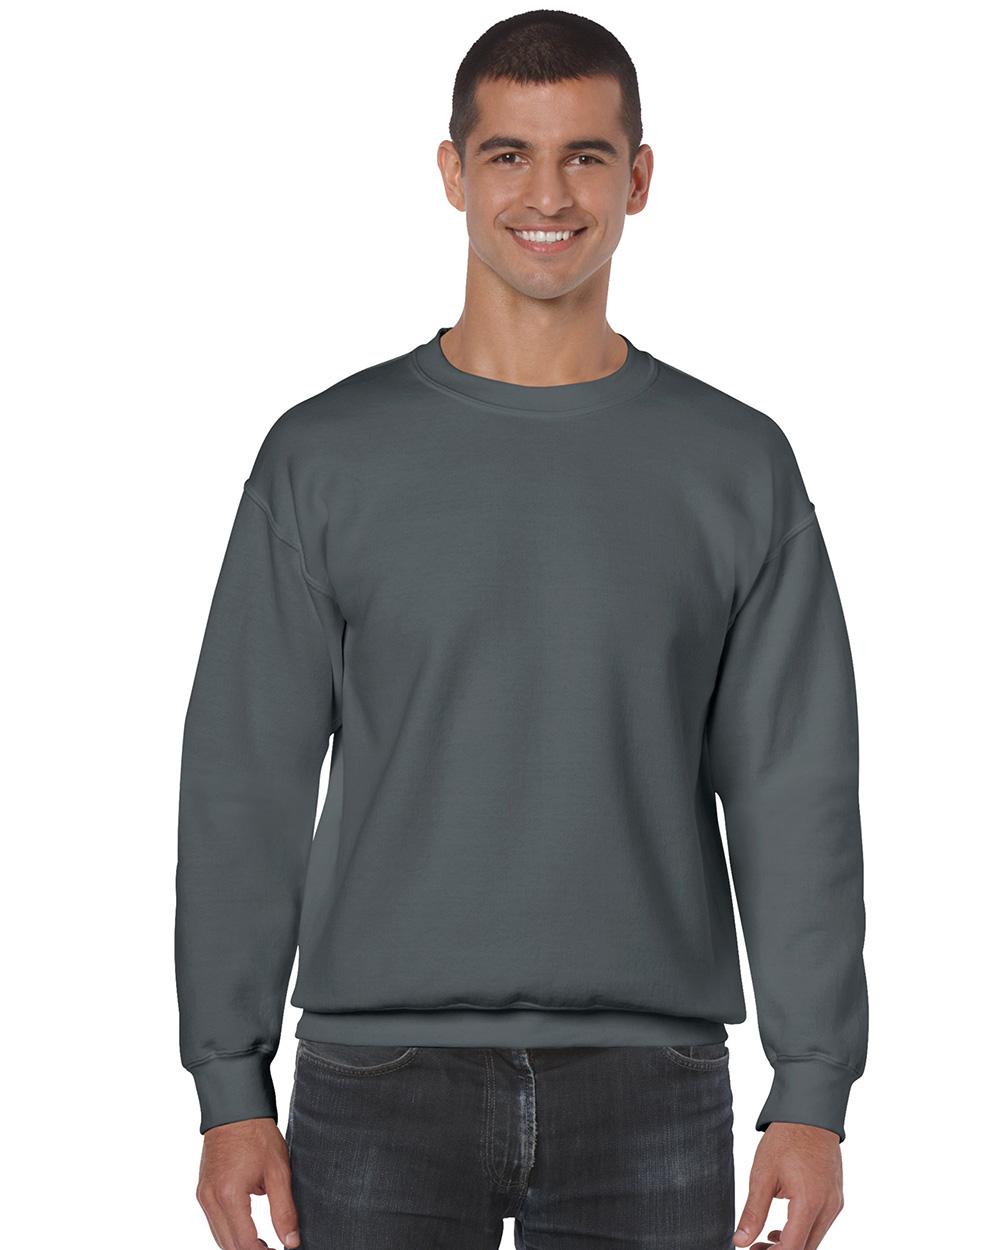 Gildan 18000     Classic Fit Adult Crewneck Sweatshirt    50% Cotton / 50% Polyester Fleece